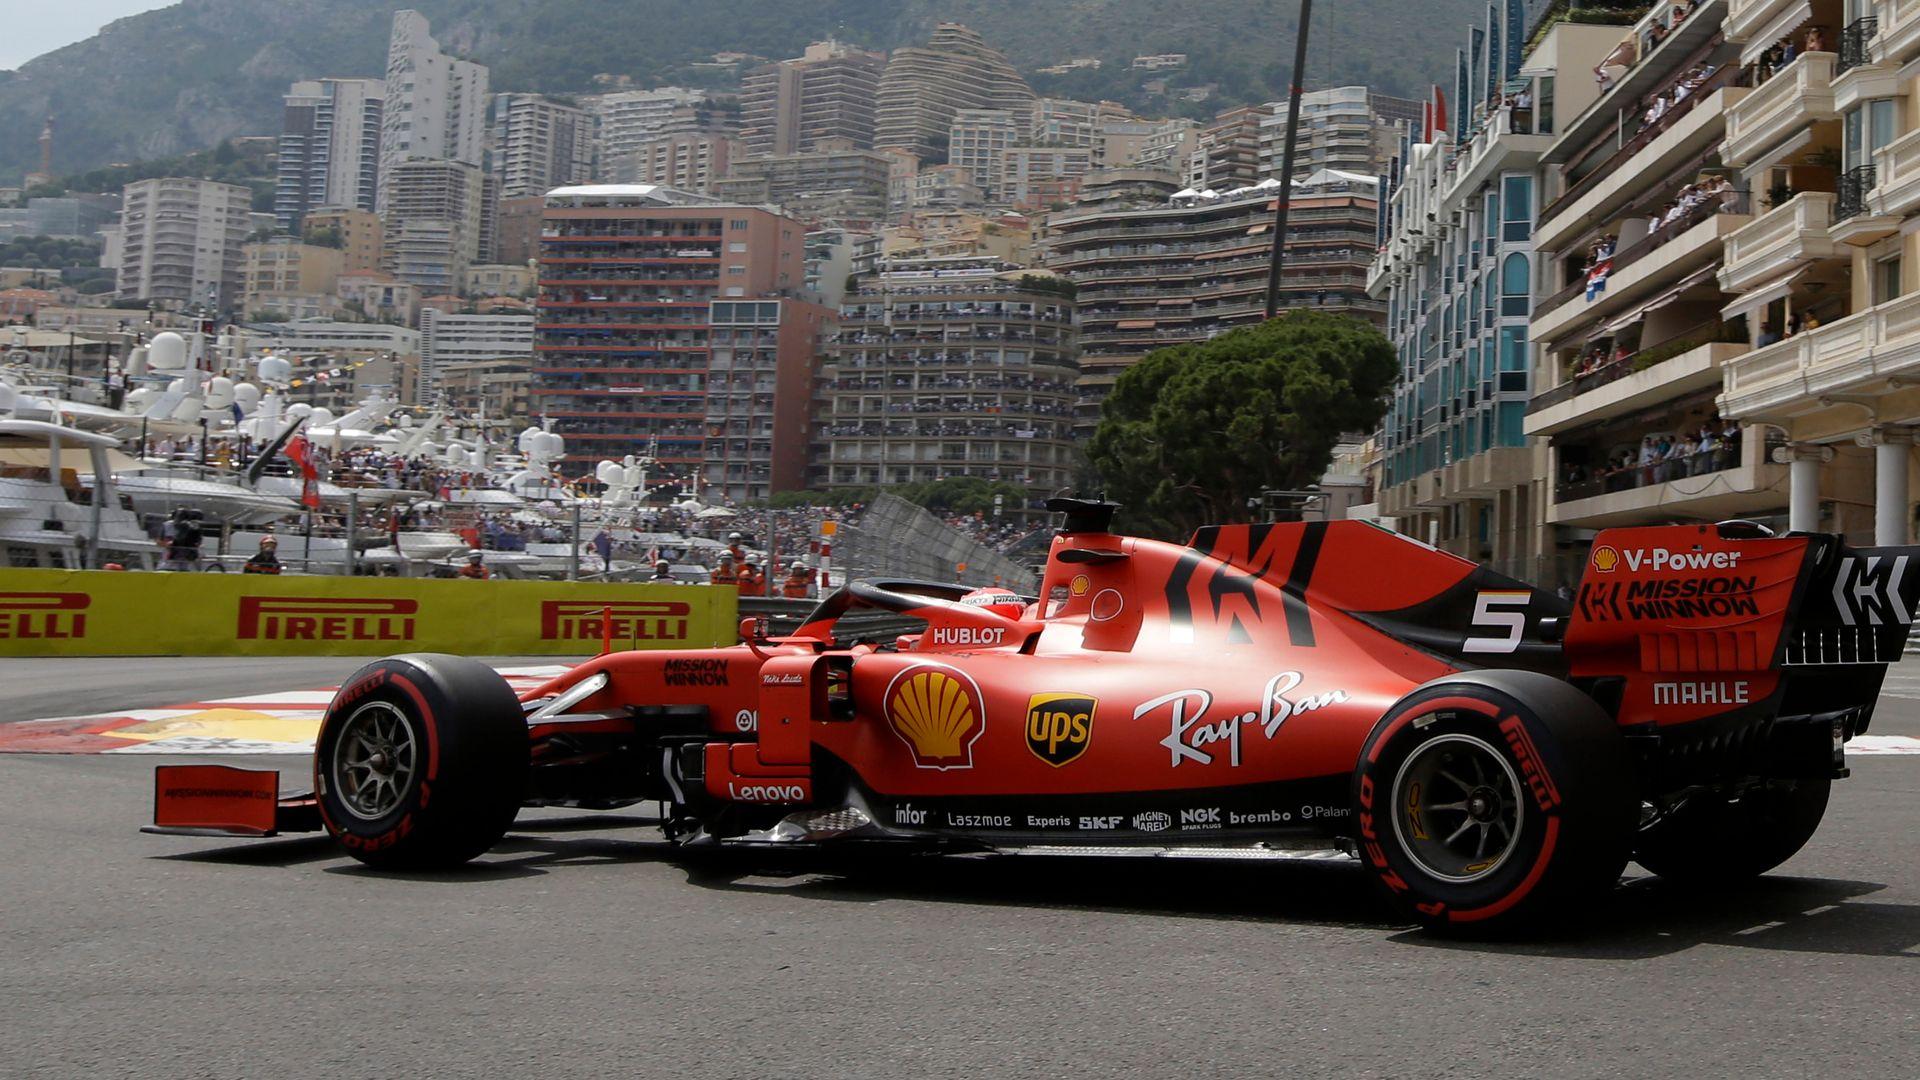 Monaco GP is back: Lewis vs Max hits the streets